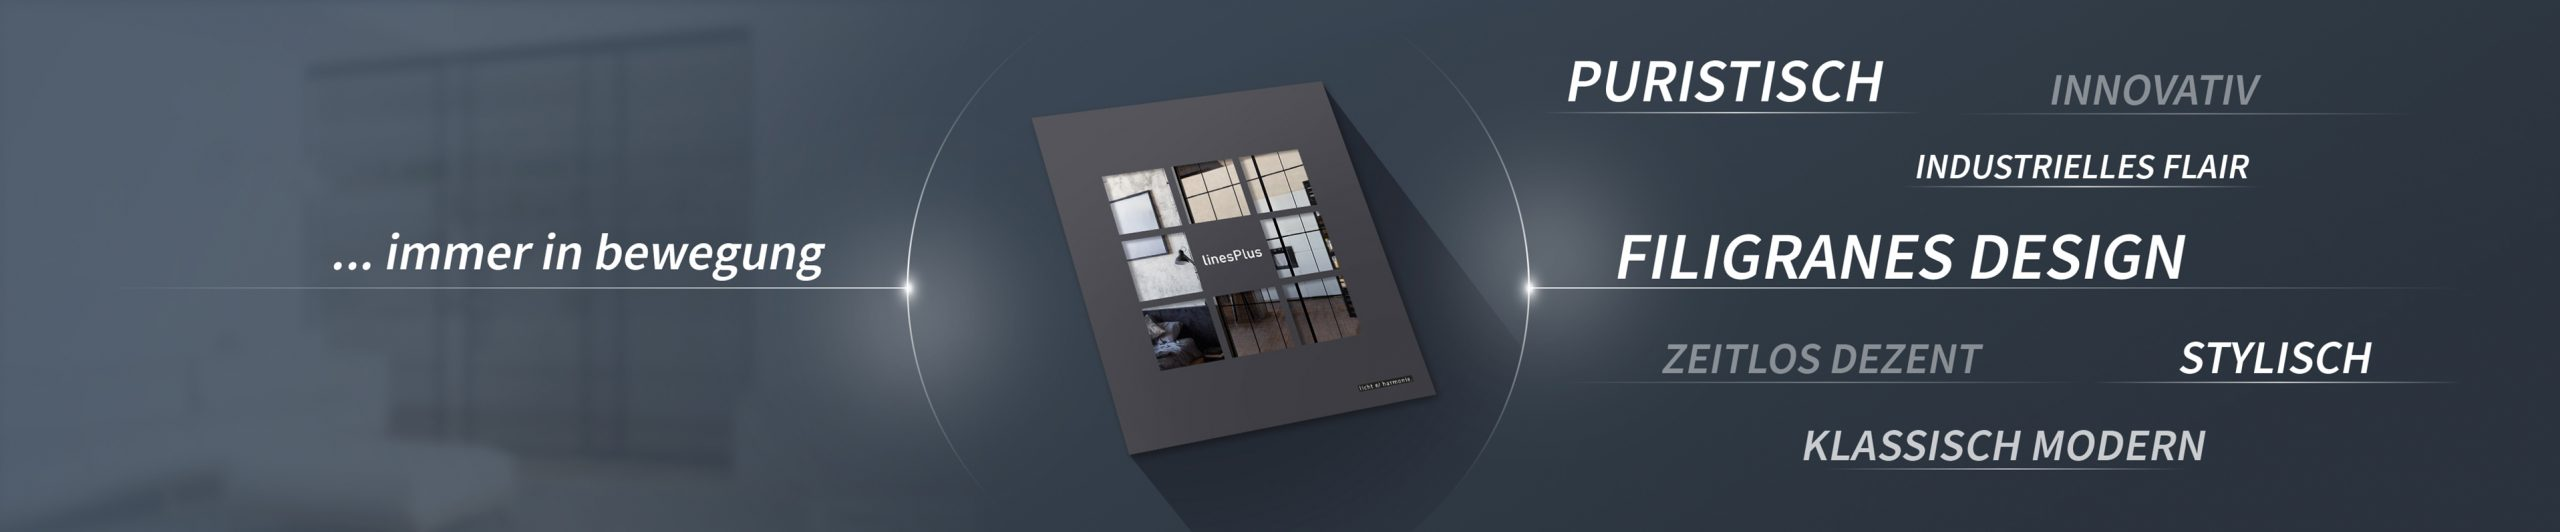 Header_Kurz_Produktneuheiten_linesPlus